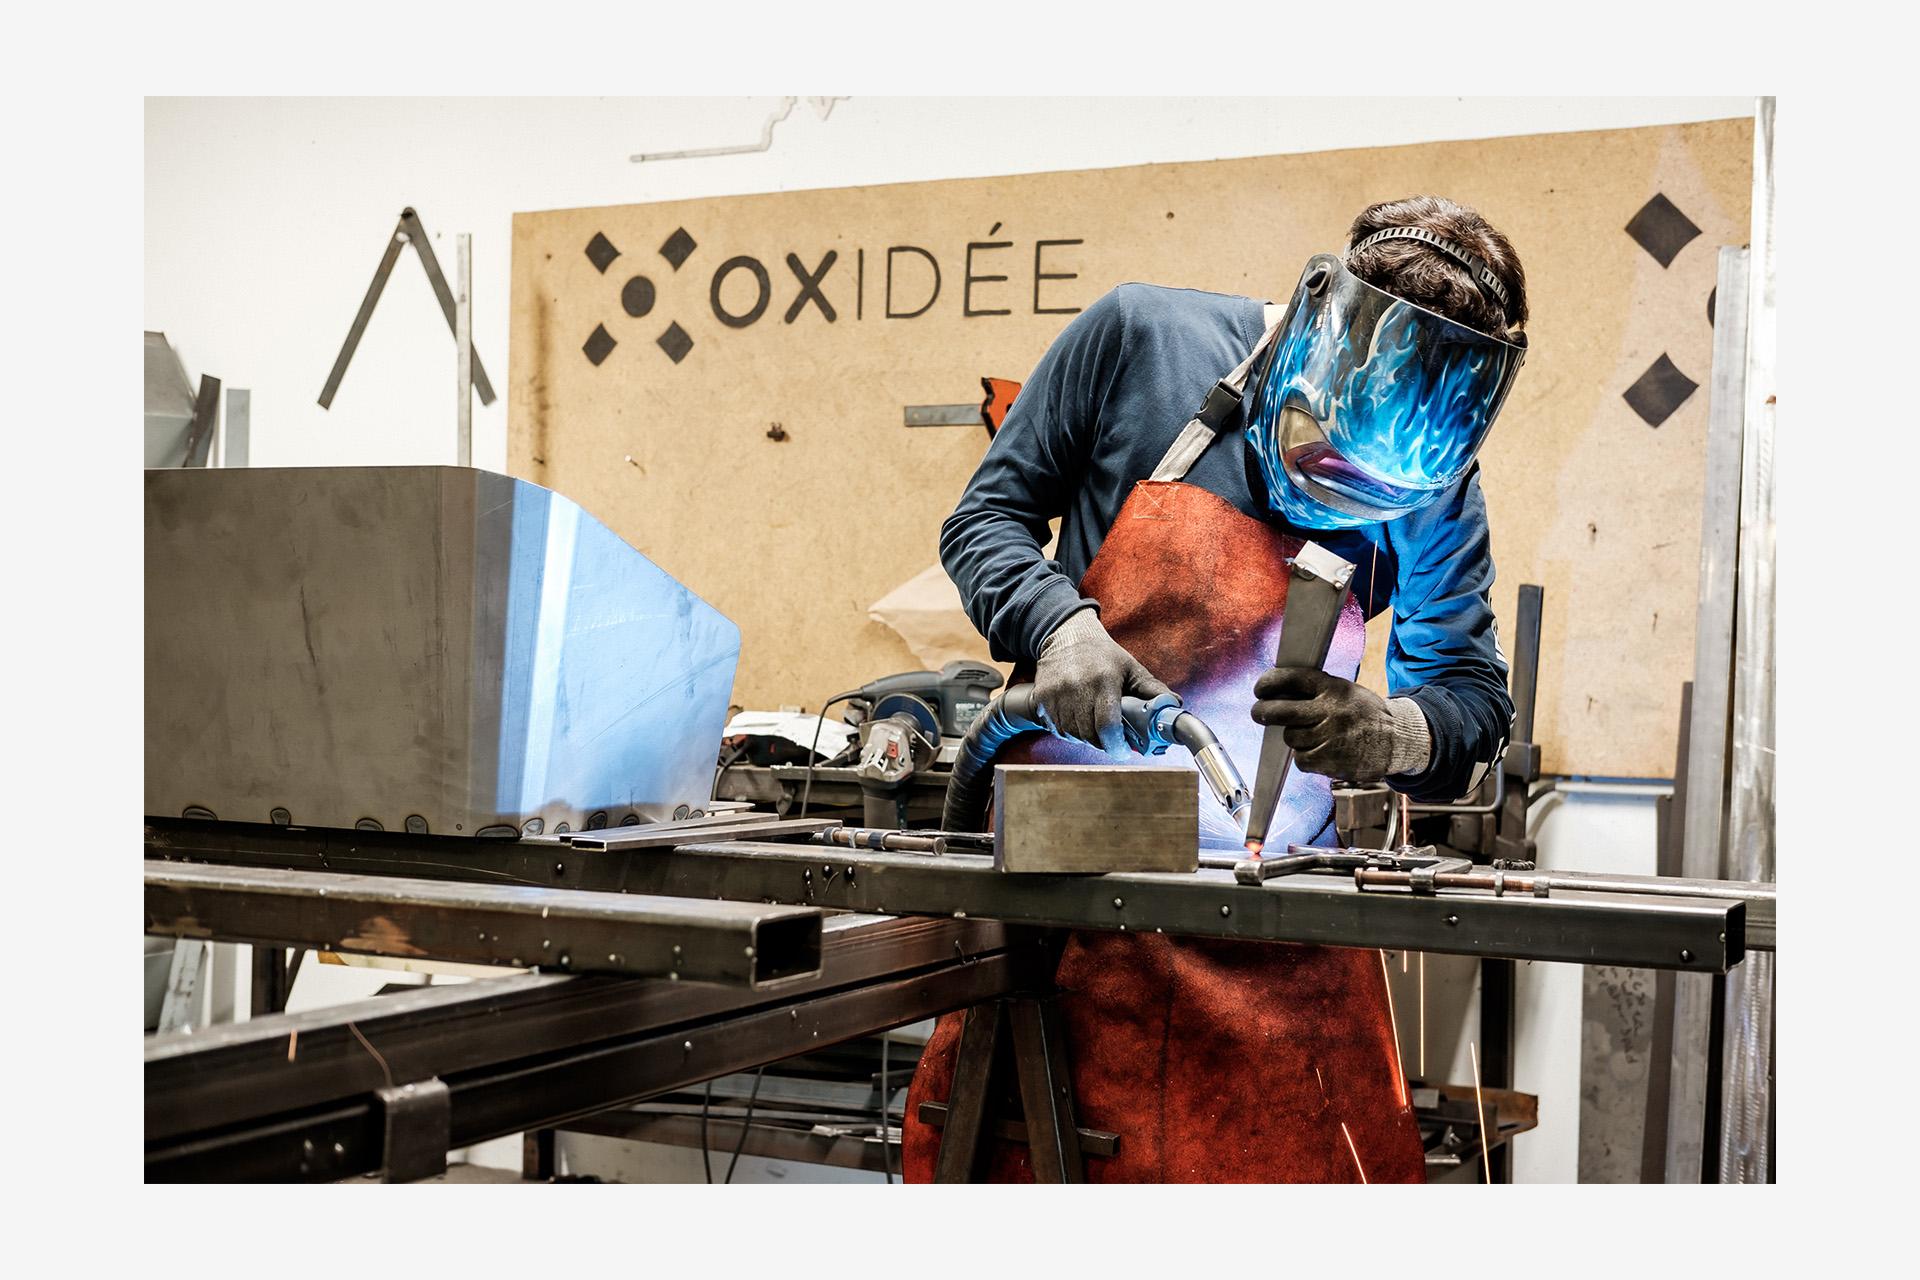 ox-idee-atelier-03B